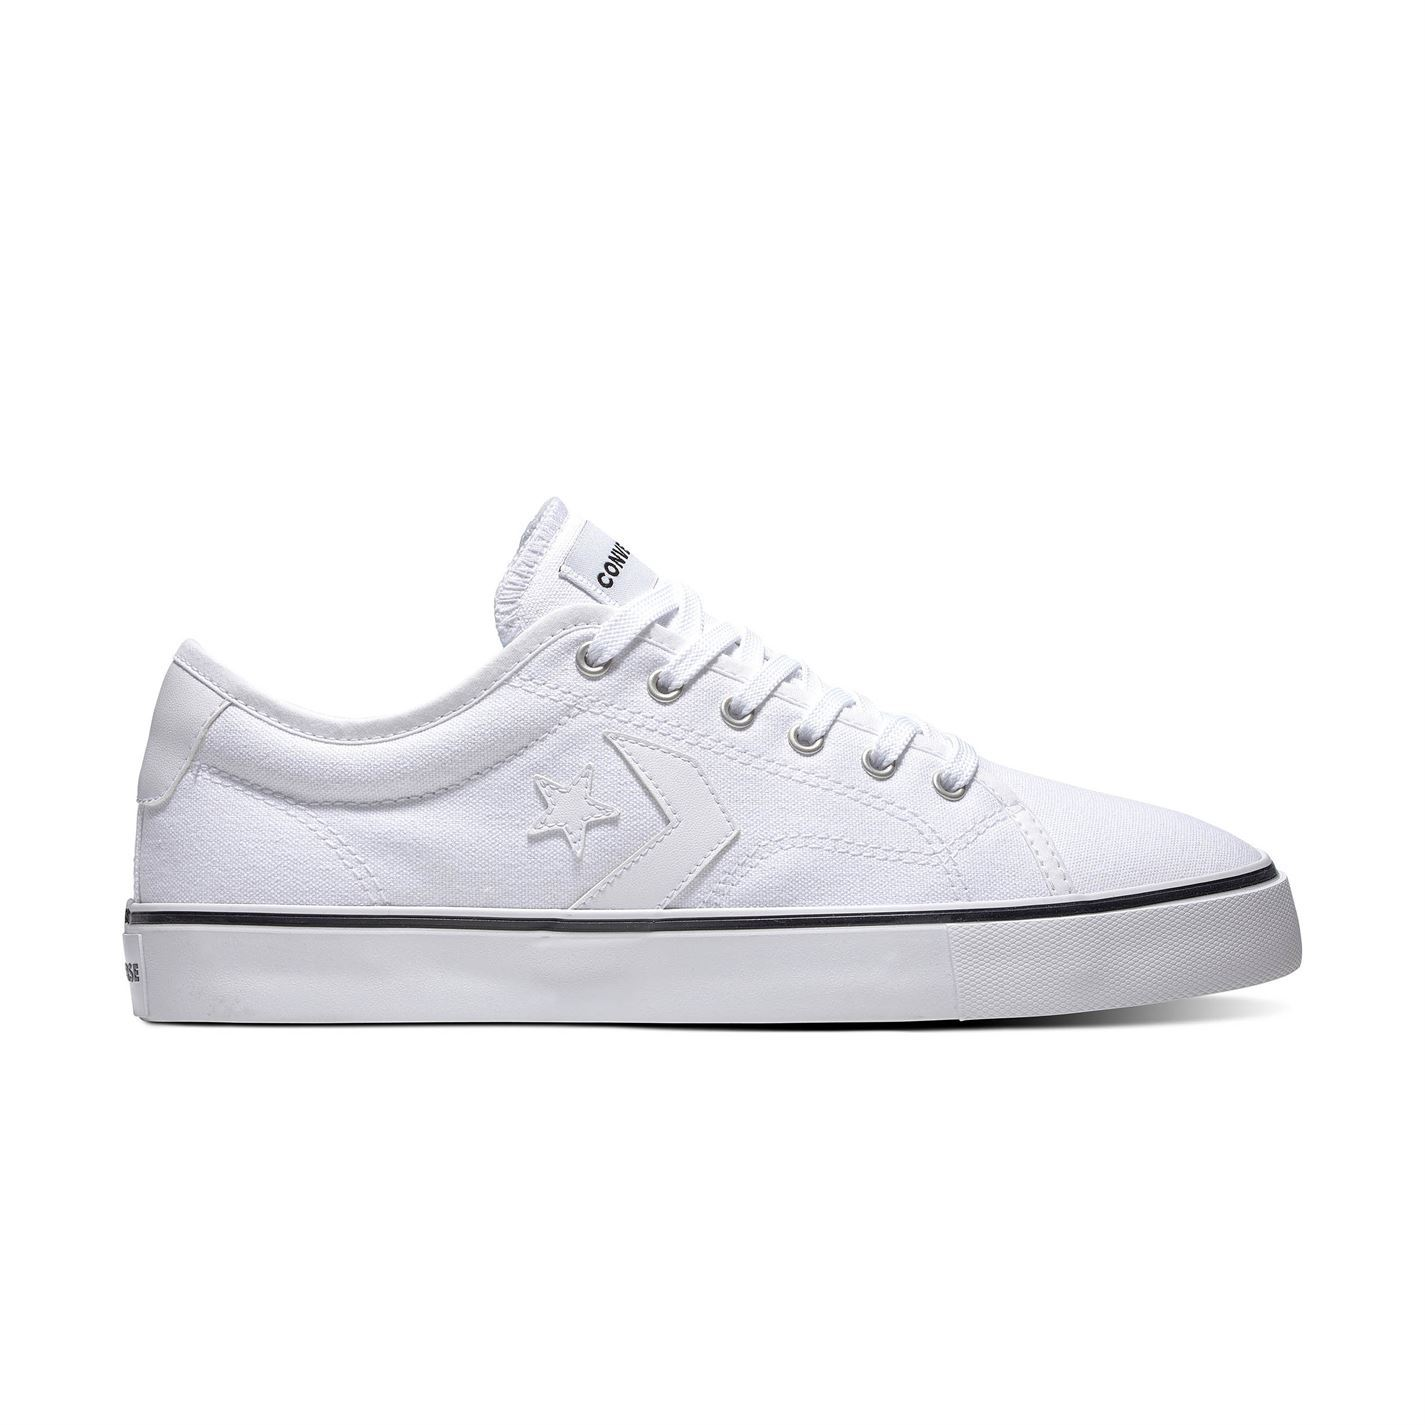 Converse-Ox-REPLAY-Baskets-Pour-Homme-Chaussures-De-Loisirs-Chaussures-Baskets miniature 33